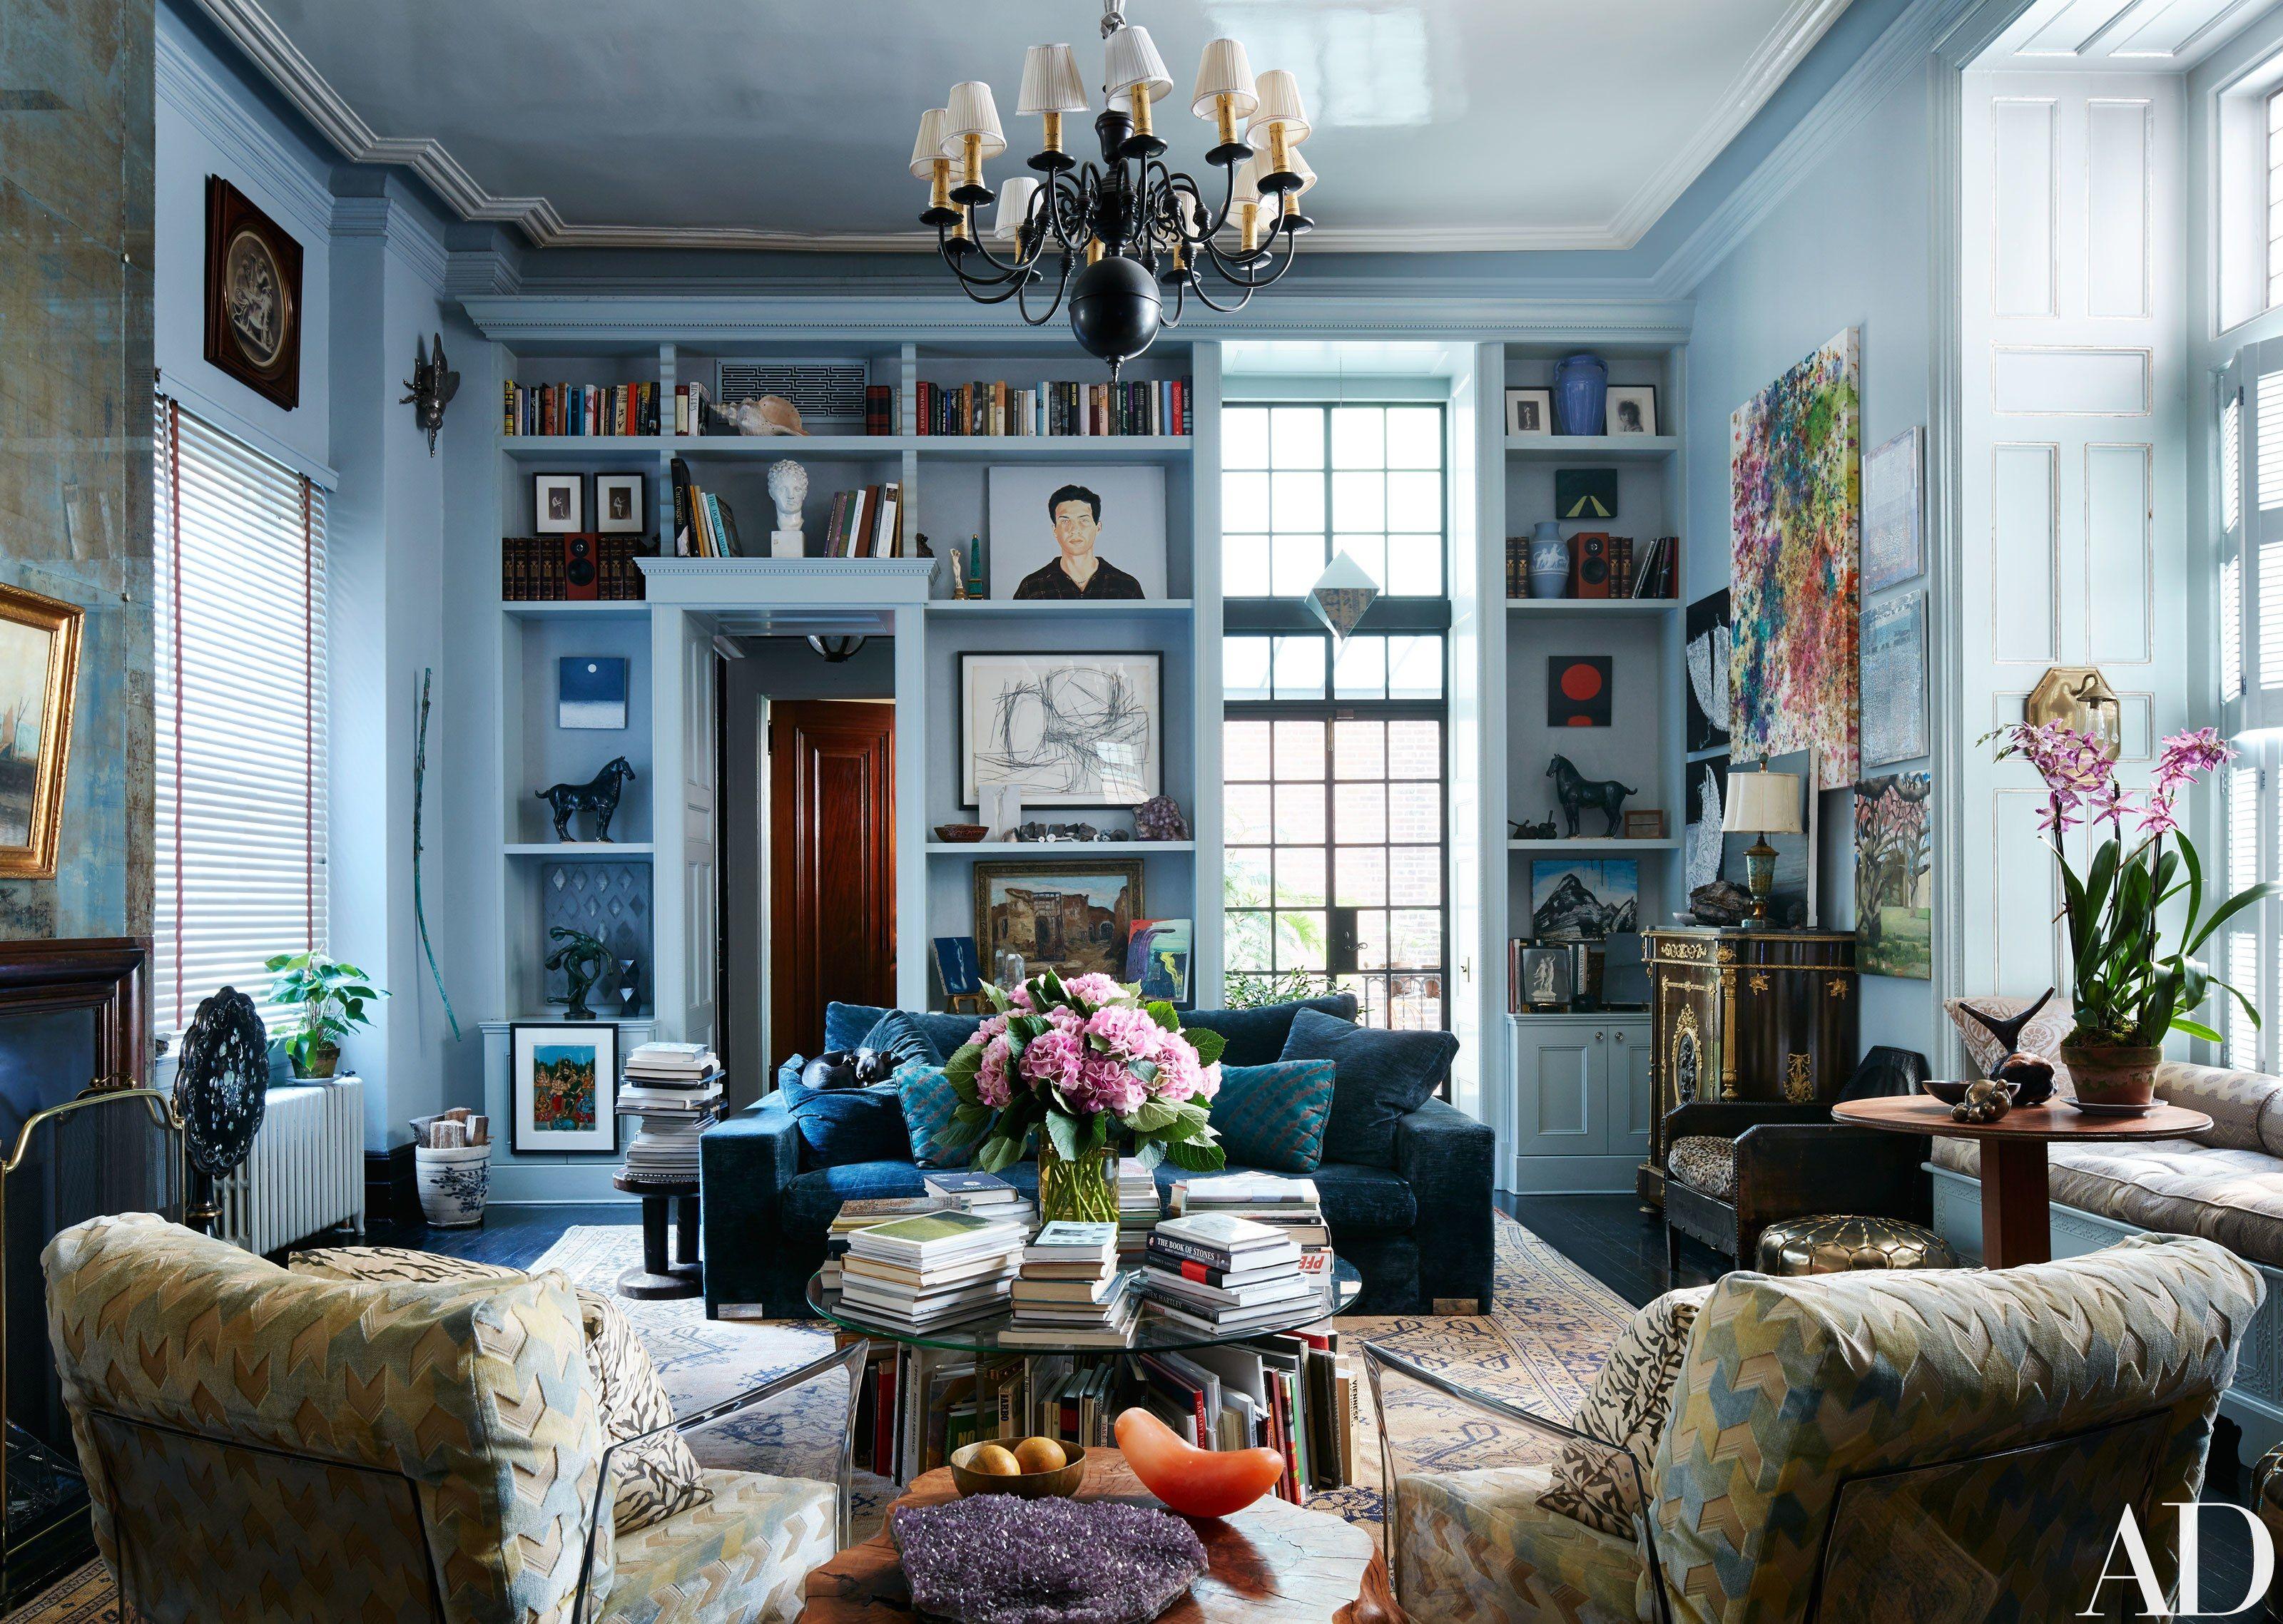 Inside Artist Jack Pierson S Dreamy Greenwich Village Apartment Living Room Decor Inspiration Coastal Decorating Living Room Greenwich Village Apartment